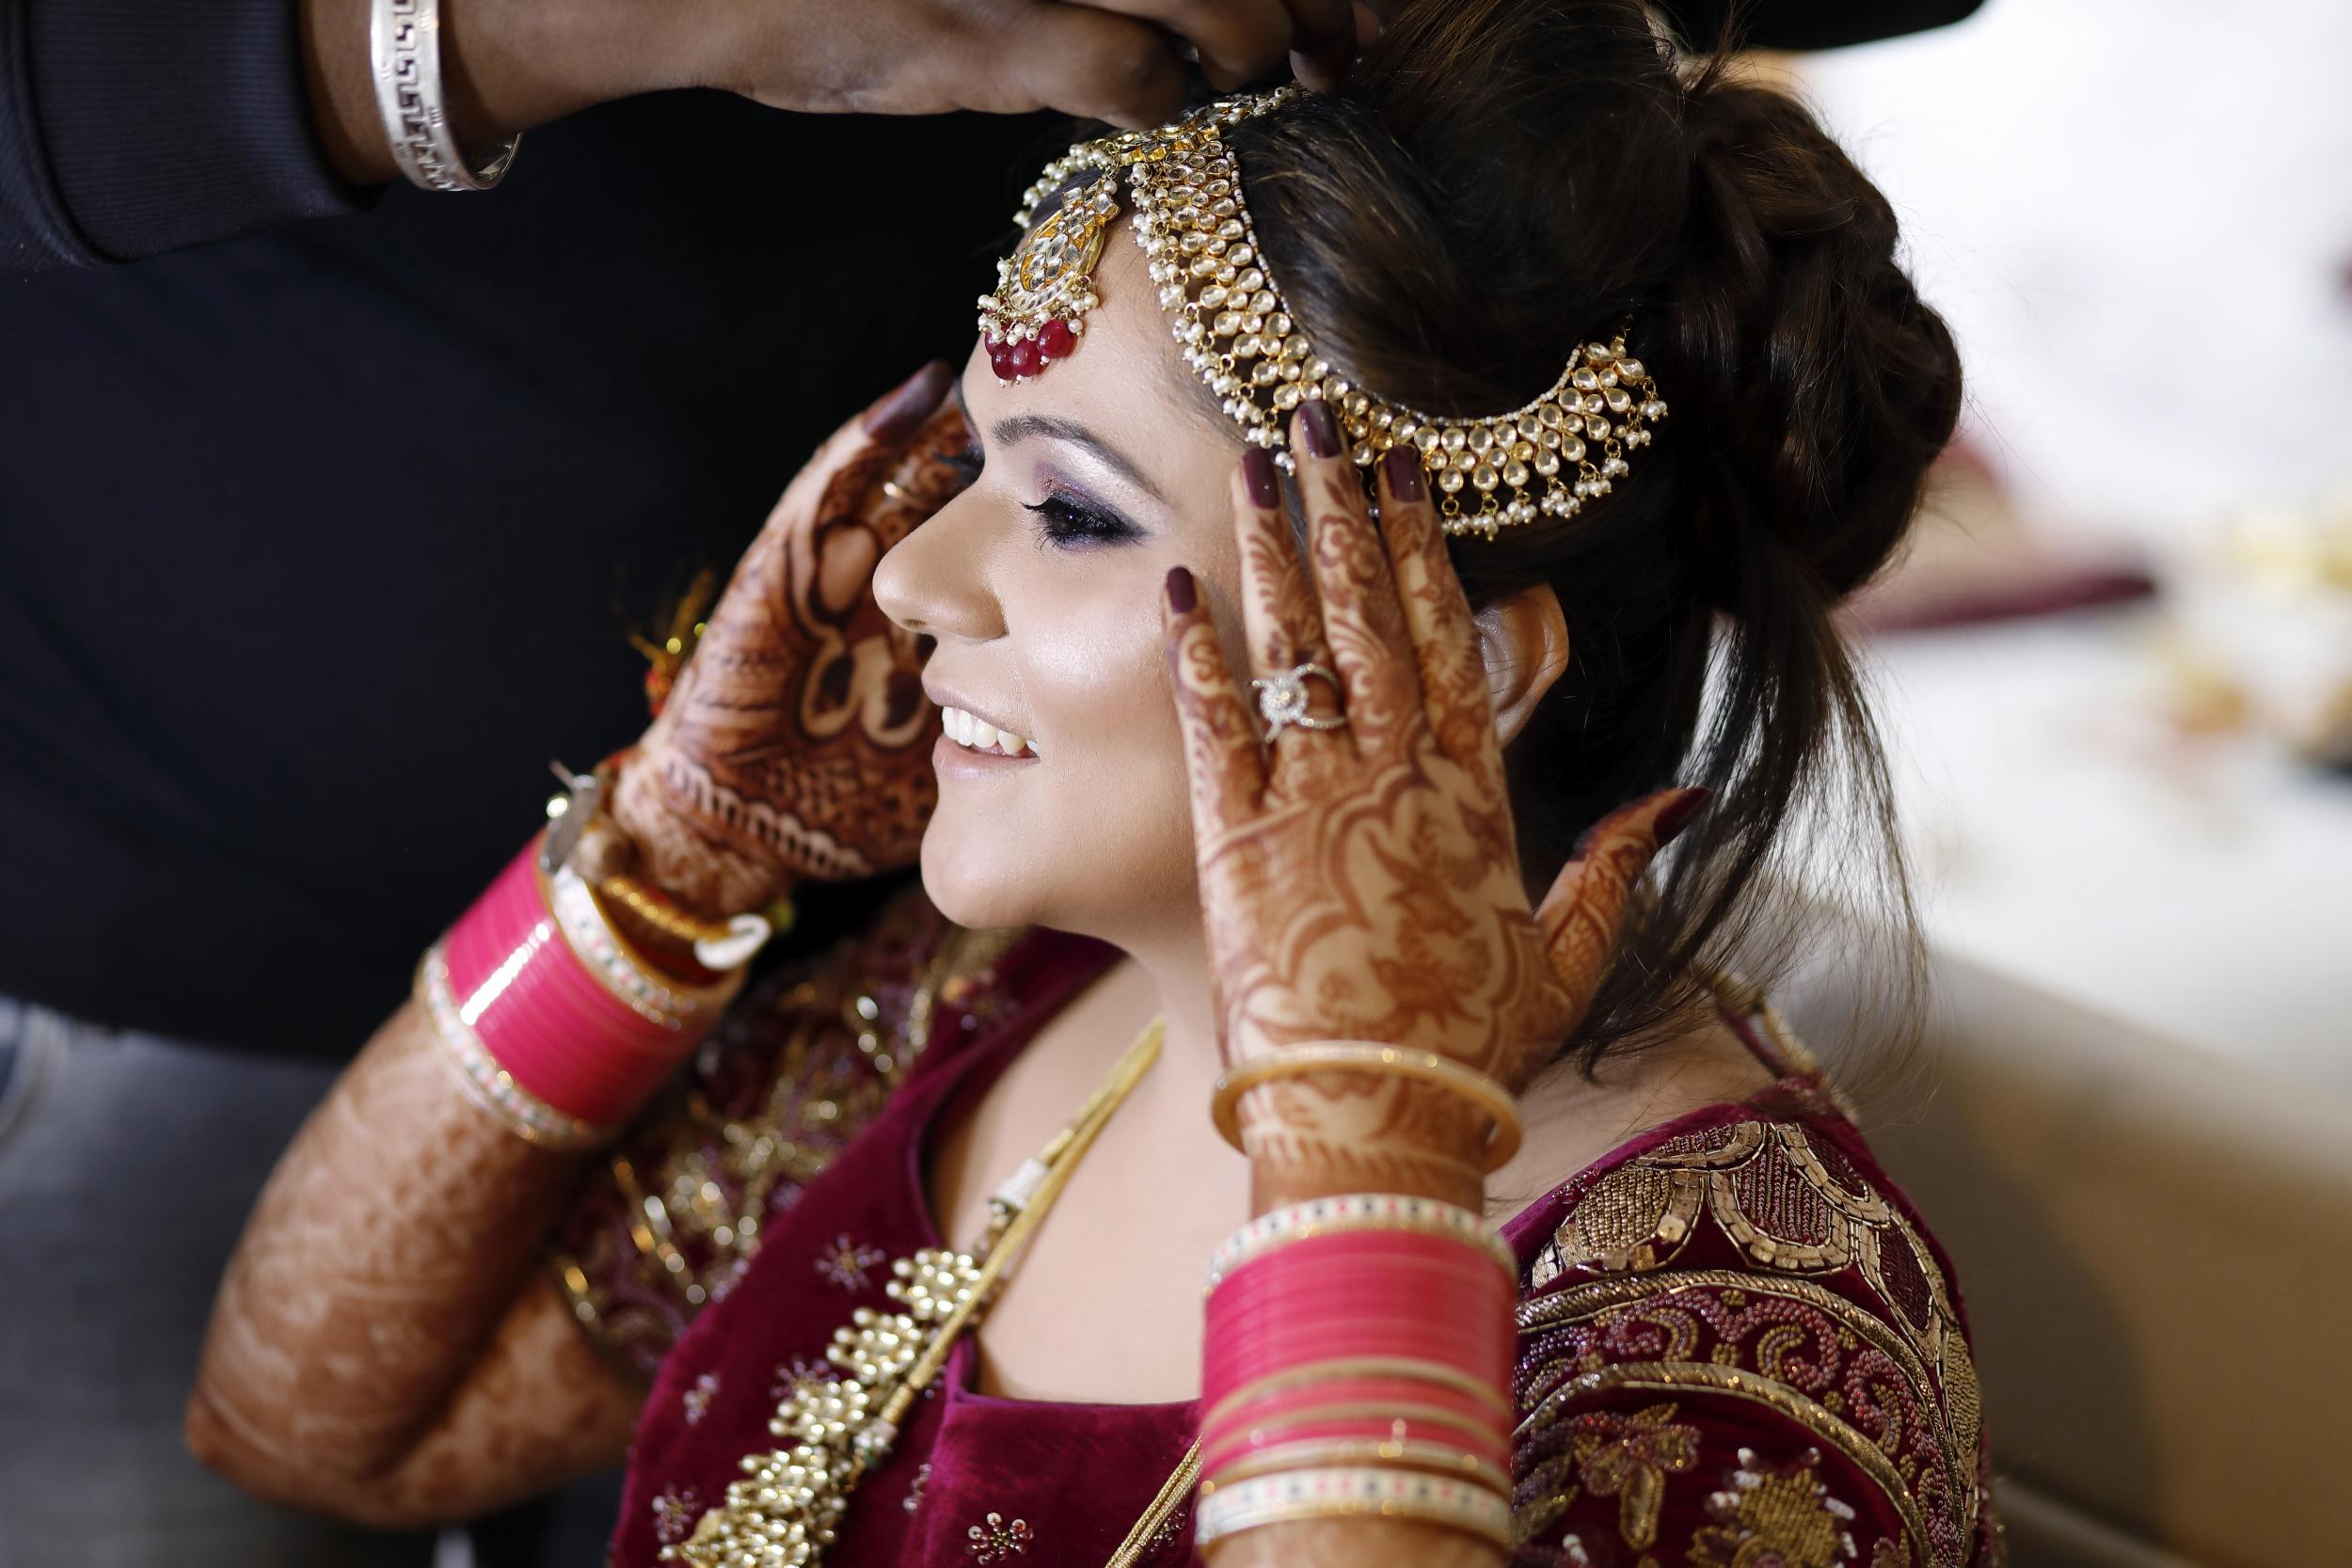 Candid wedding photographersC69A0557 Delhi